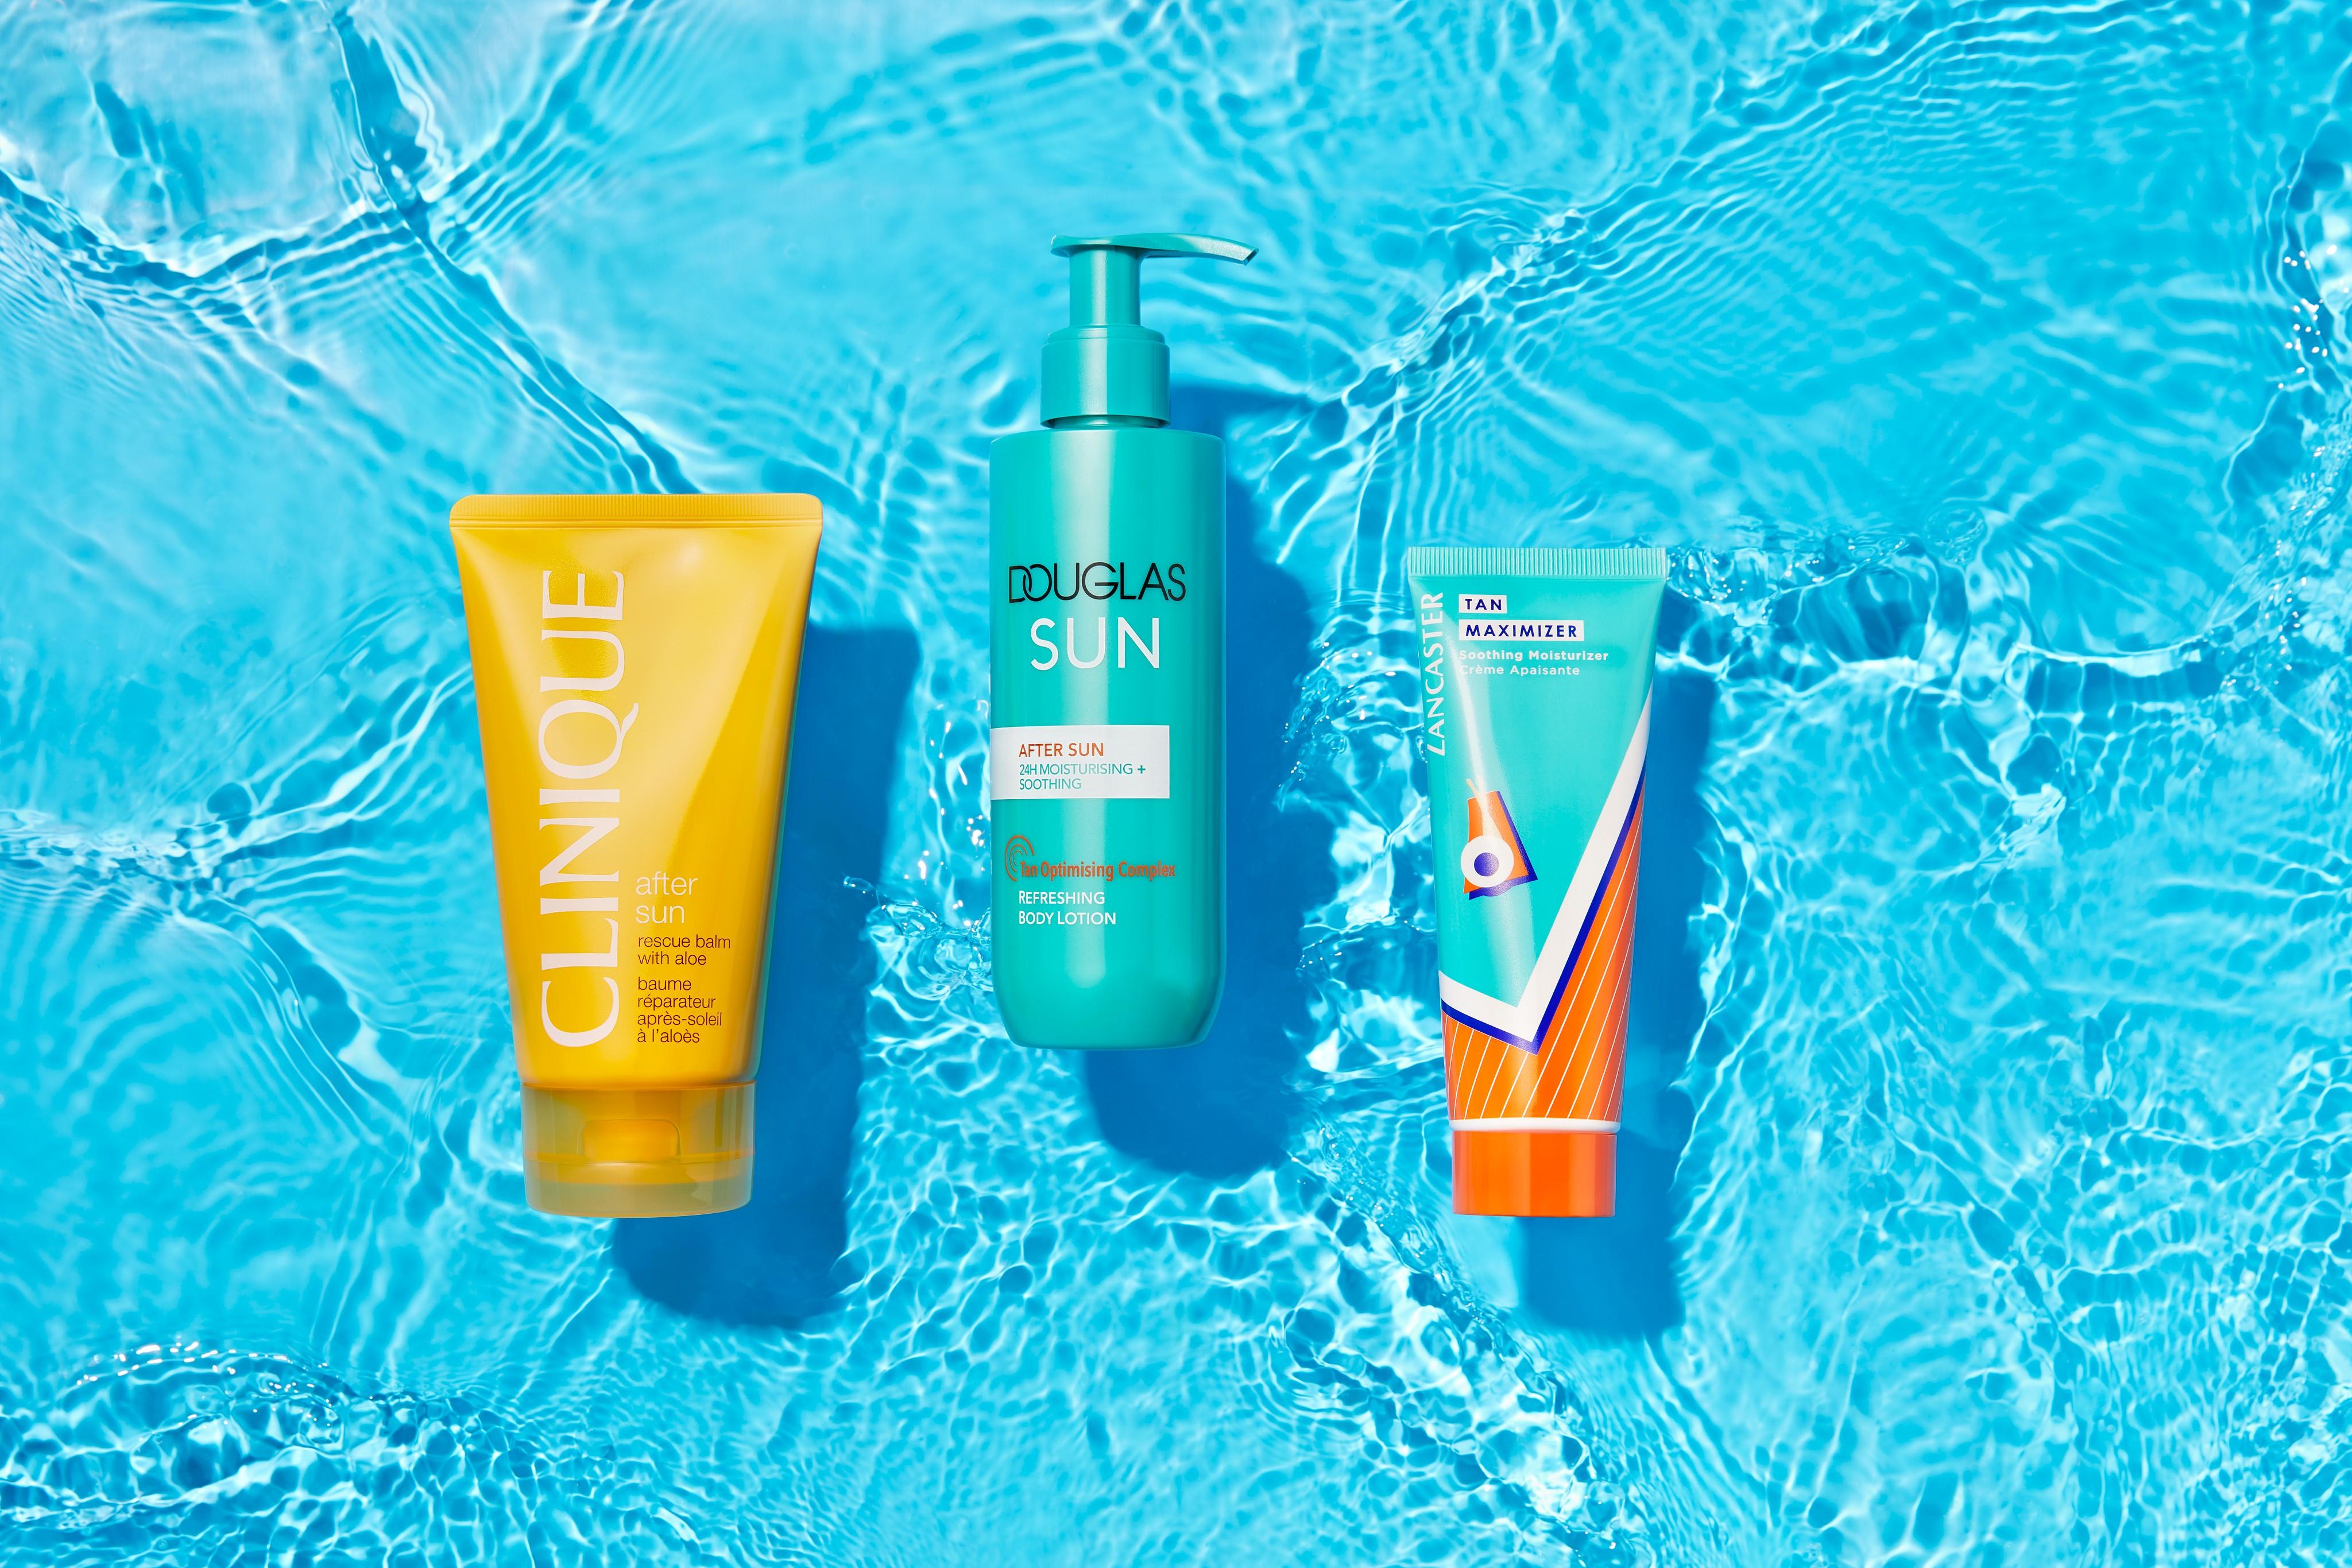 Skincare-product-on-water-douglas-collection-clinique-lancaster-unlimited-Web-Rendition